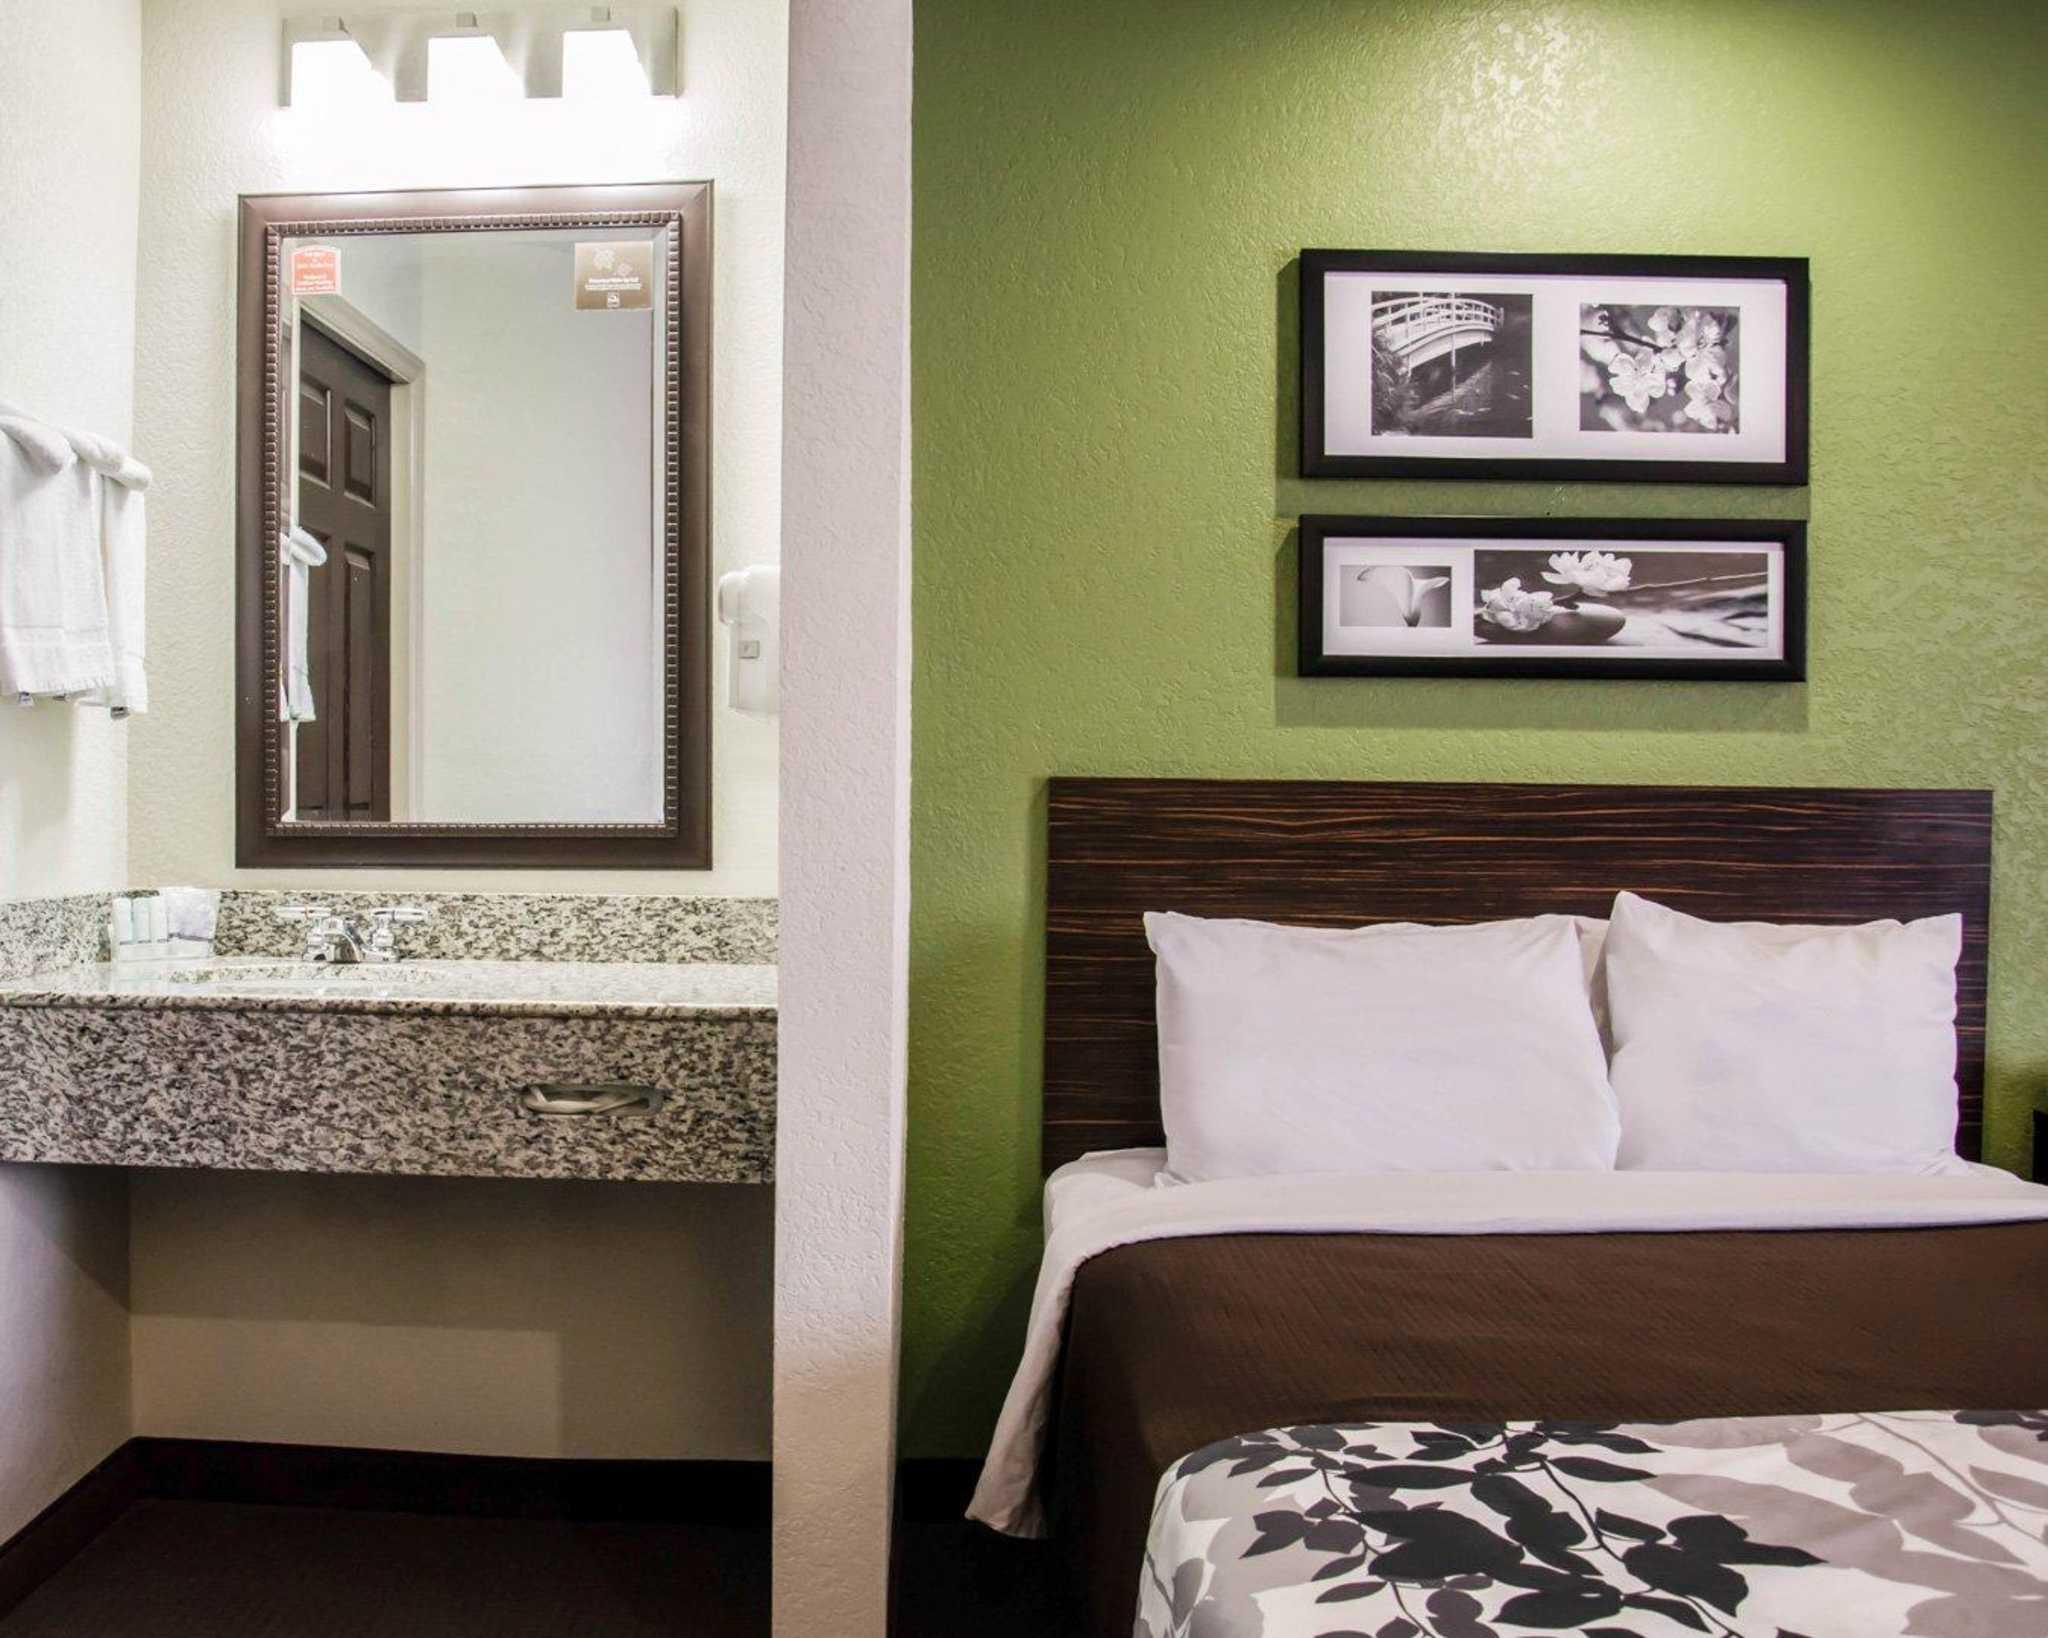 Sleep Inn Concord - Kannapolis image 5